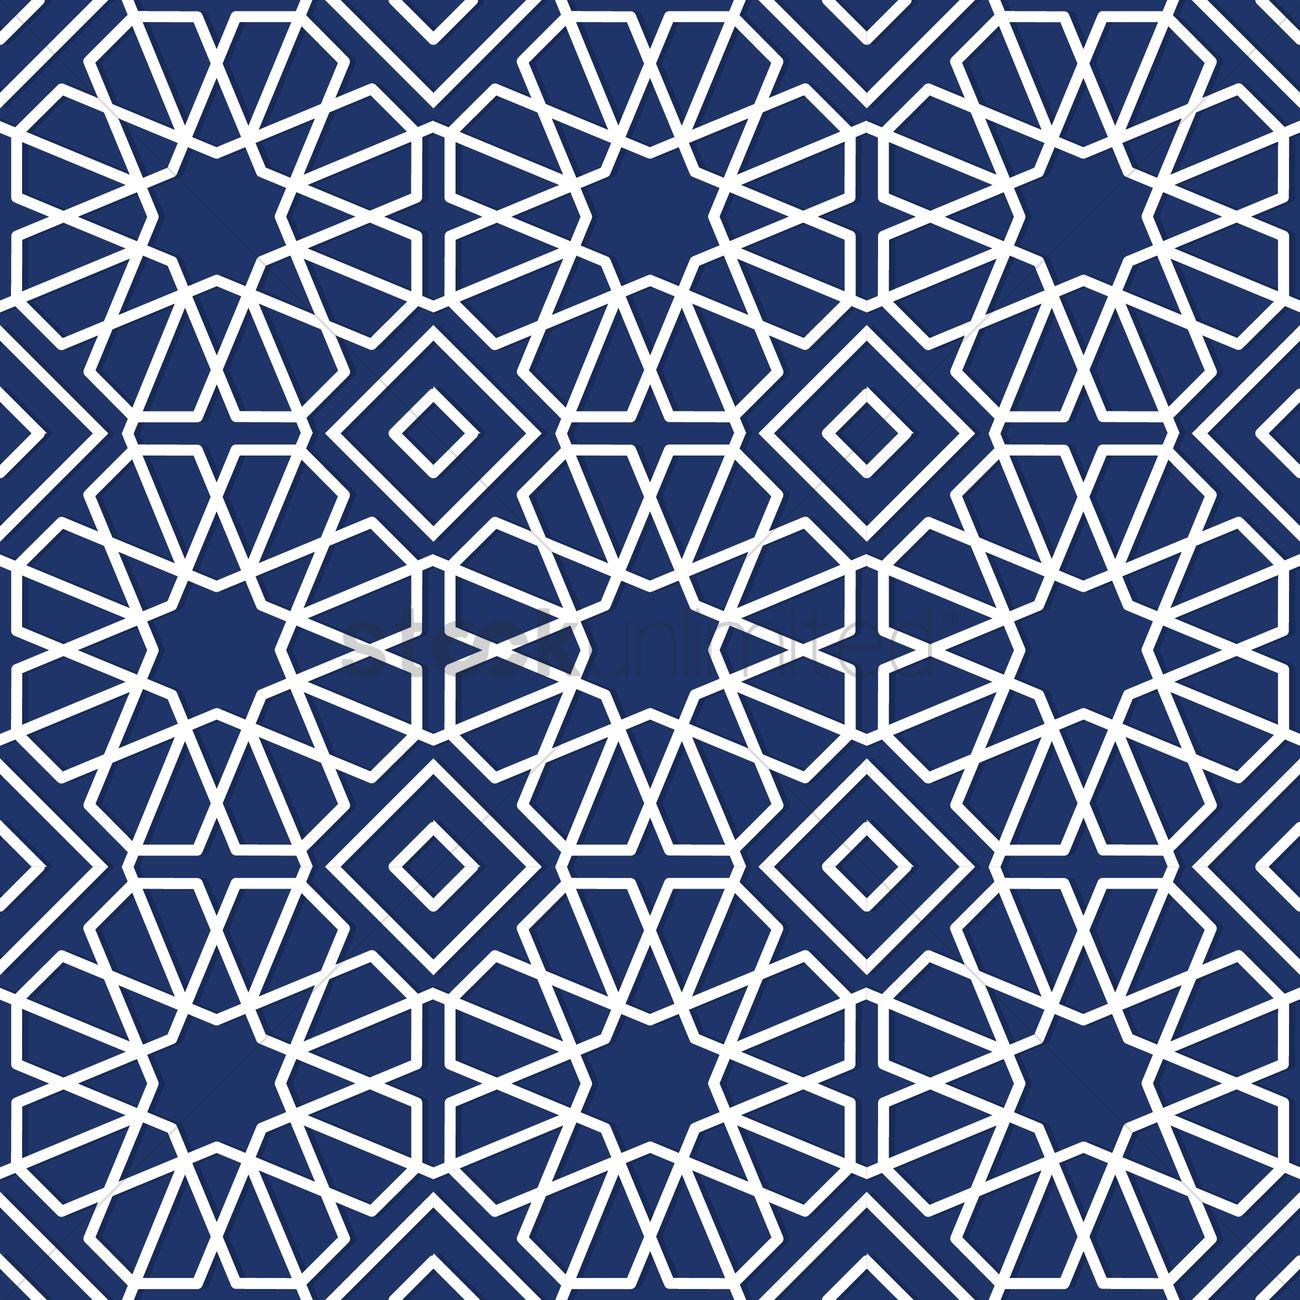 islamic geometric pattern design vector image 1979675